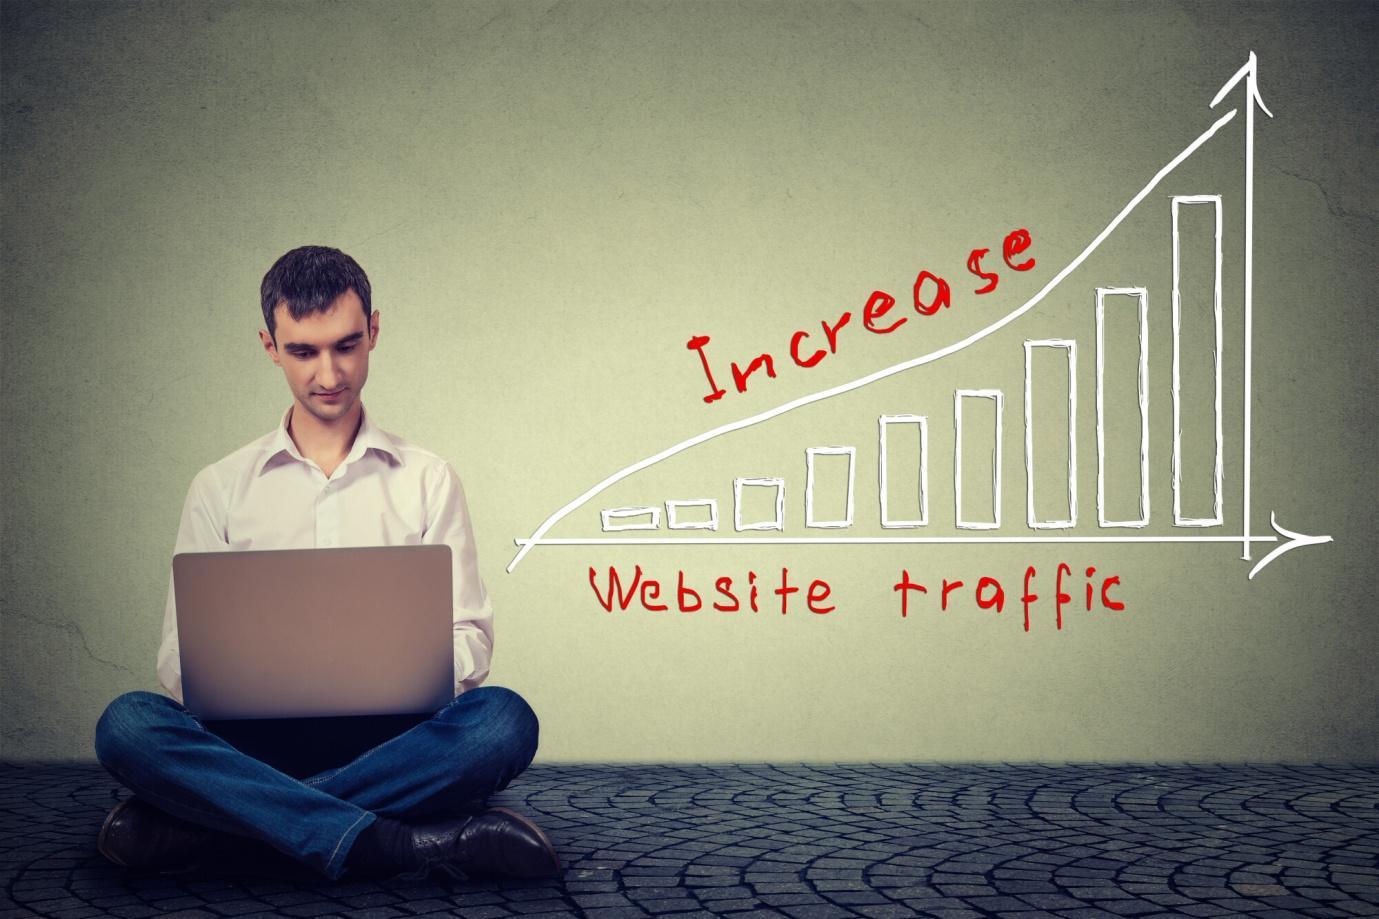 https://contentmanager.io/job/load-image?id=228176&filename=edd3250e836da760a1f0ba2fe6ecb4fc.jpeg